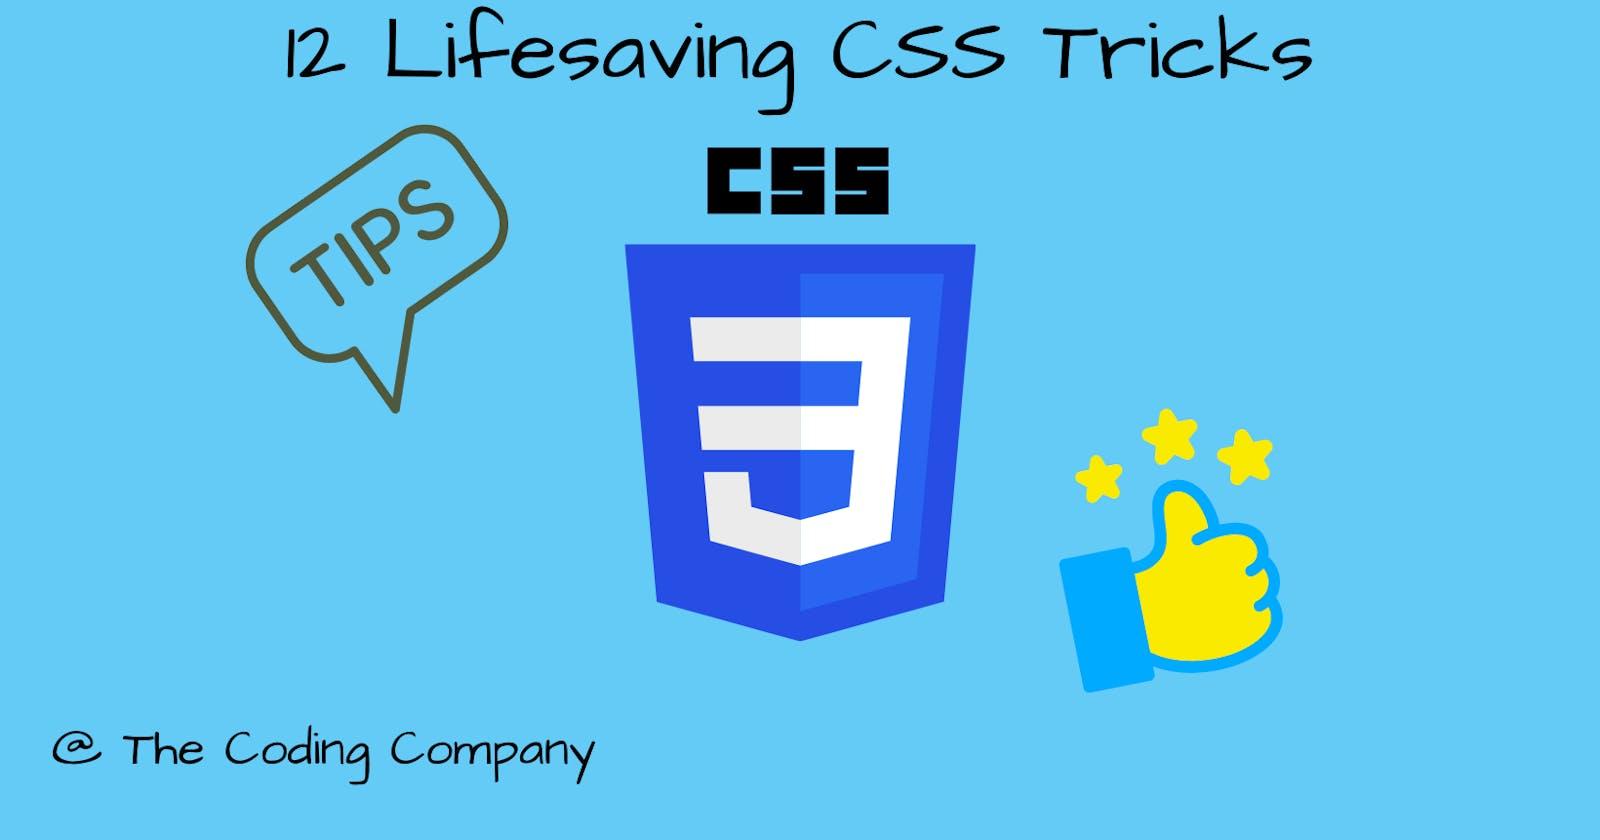 12 Lifesaving CSS tricks✨